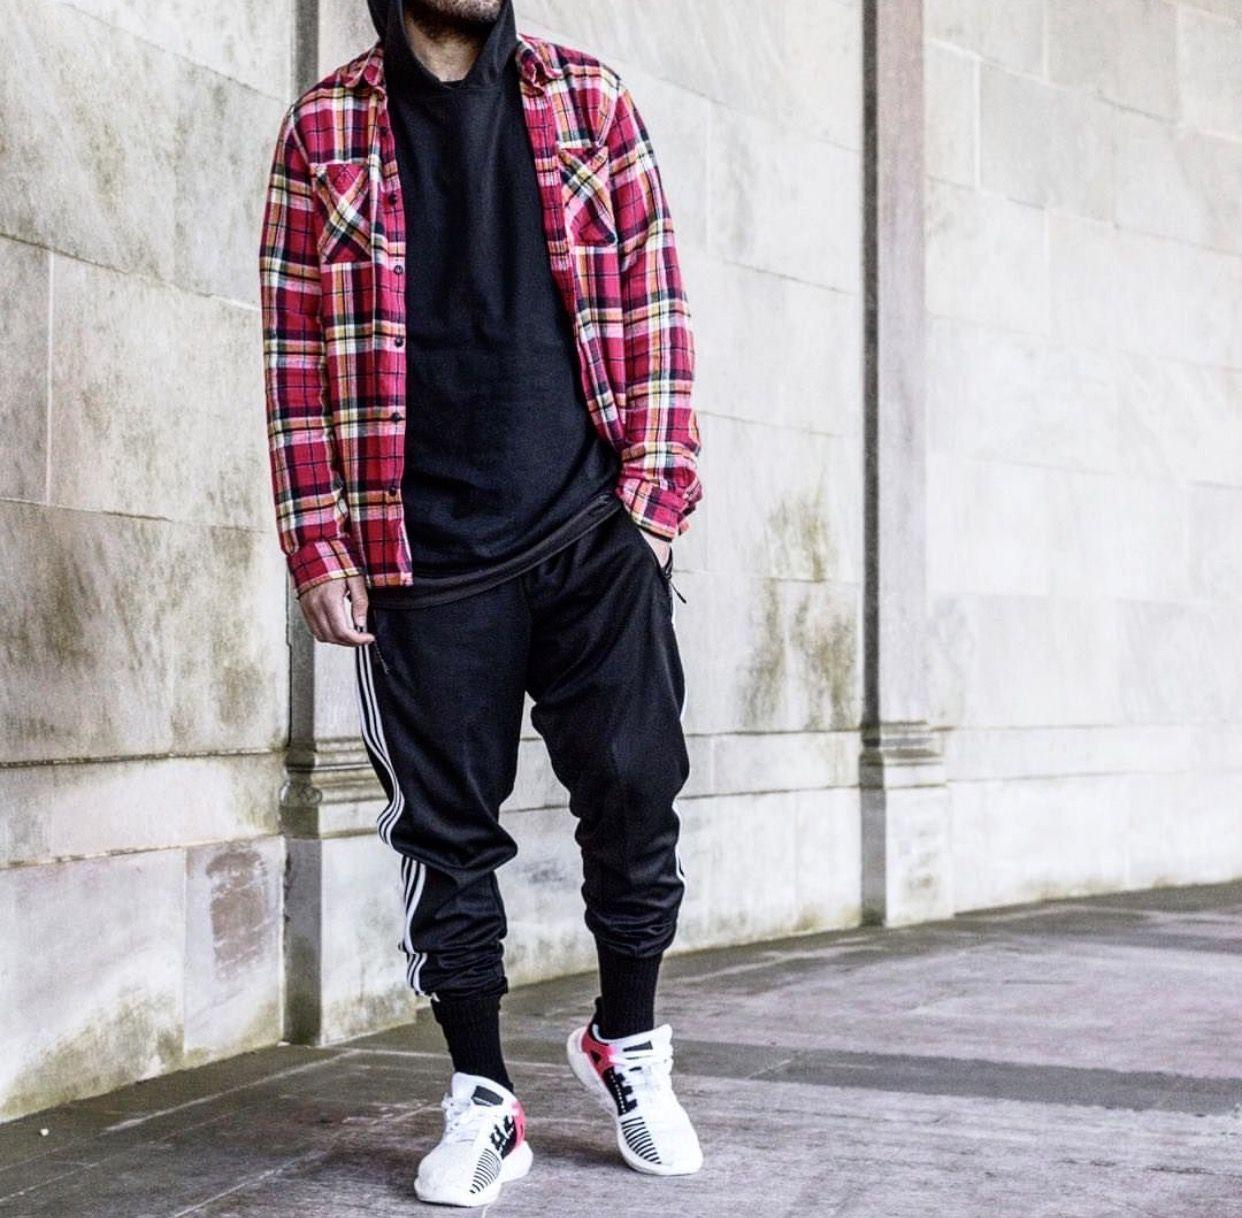 adidas eqt running support 93 tokyo rose